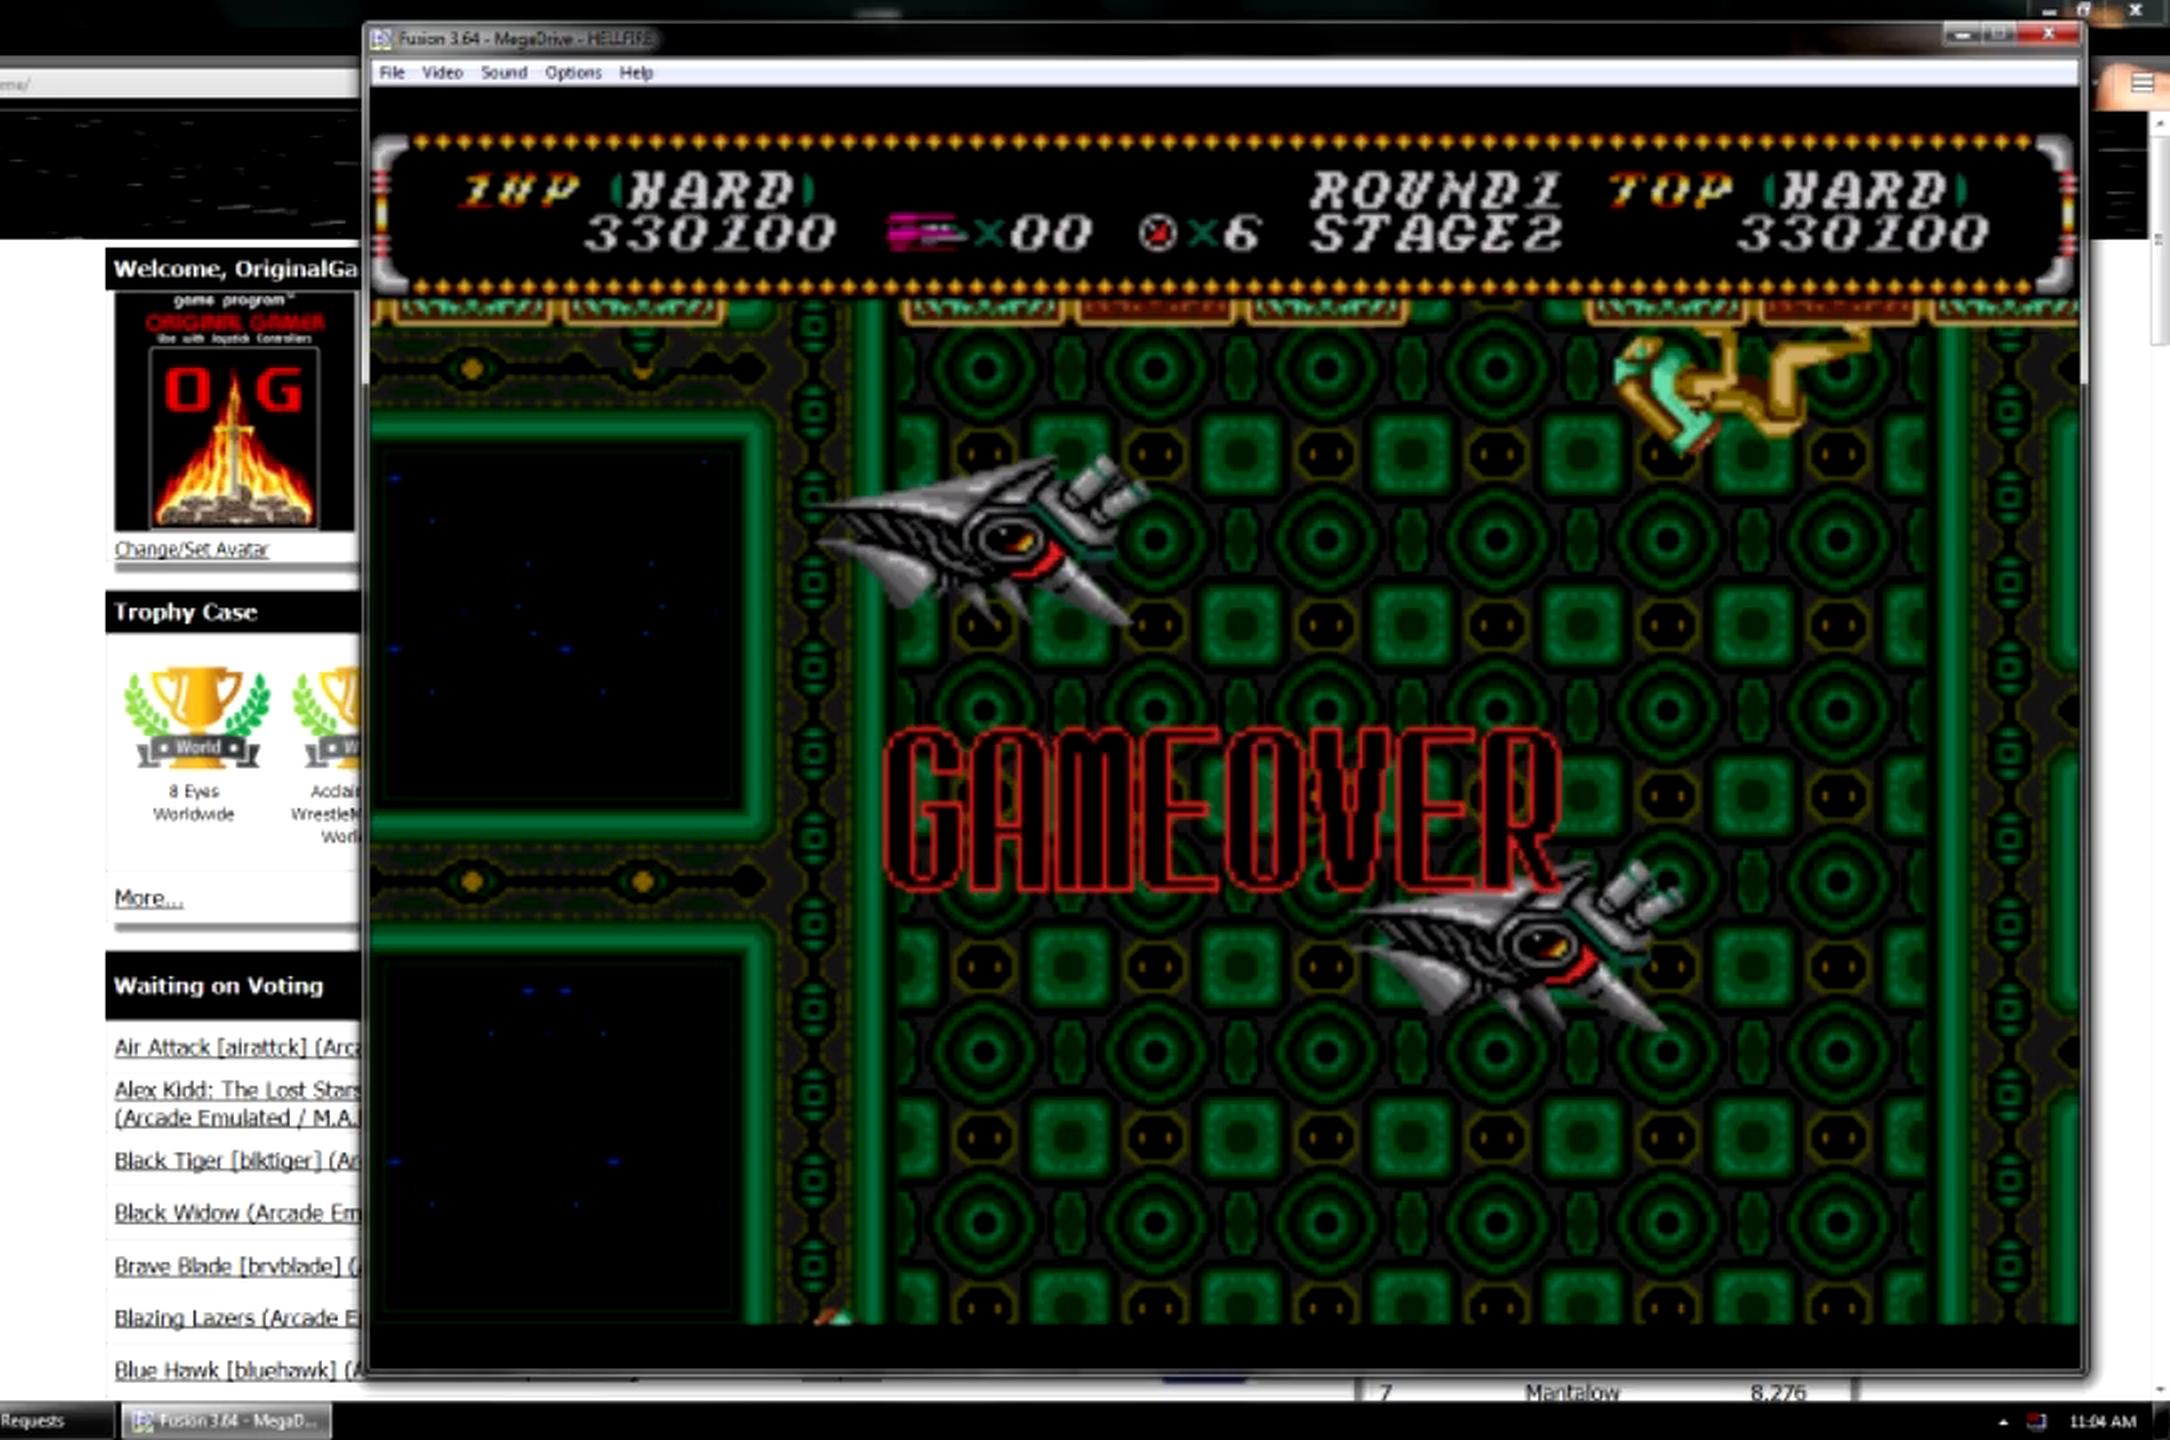 OriginalGamer: Hellfire: Hard (Sega Genesis / MegaDrive Emulated) 330,100 points on 2015-06-08 23:58:01